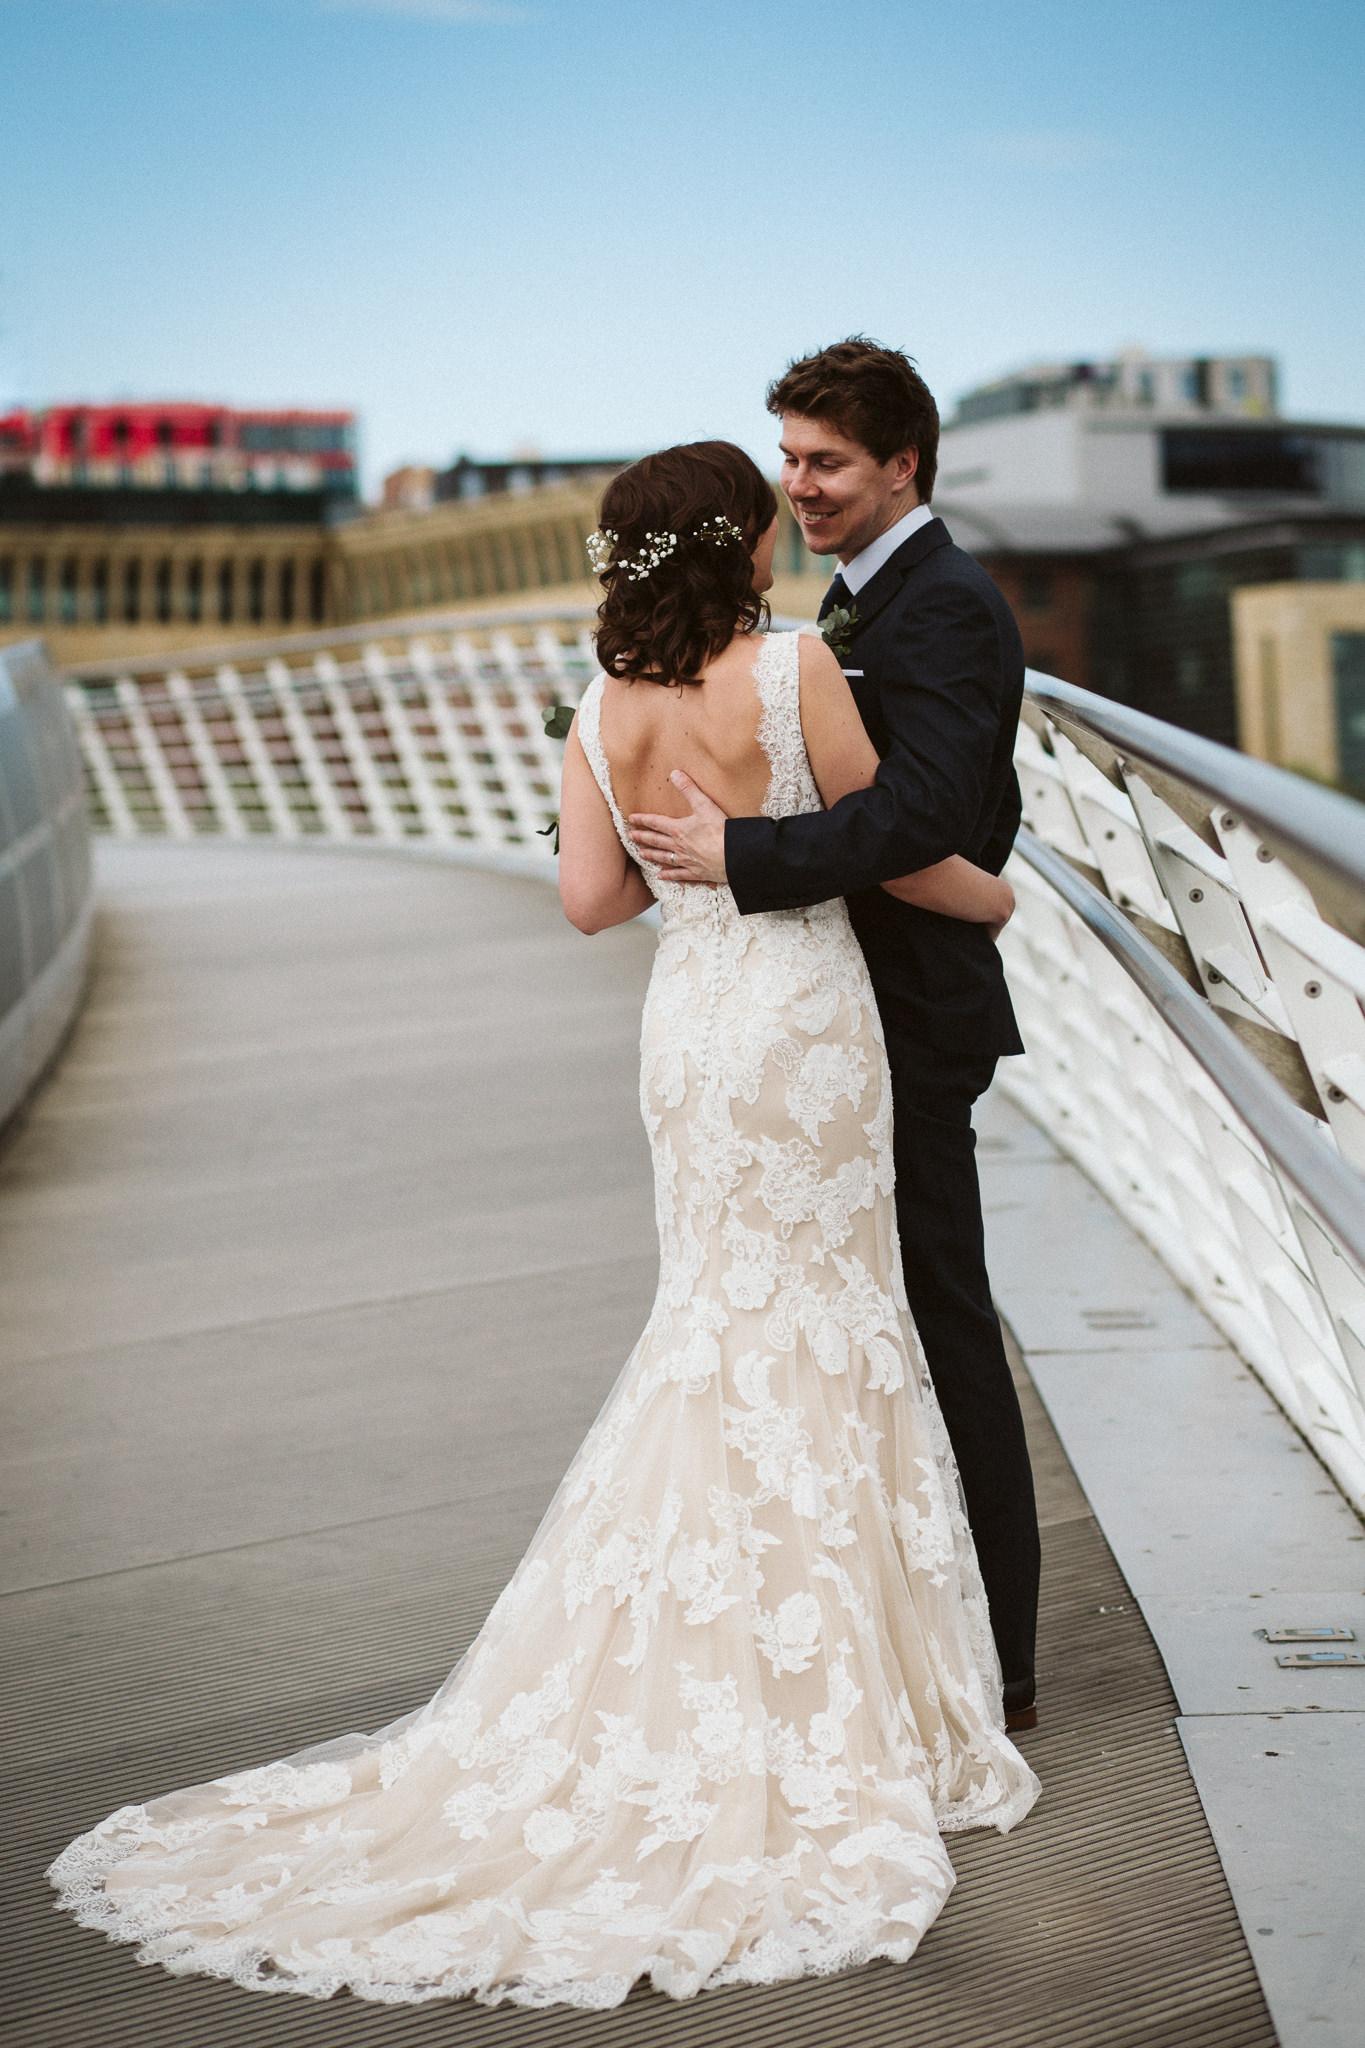 baltic-wedding-margarita-hope (42).jpg